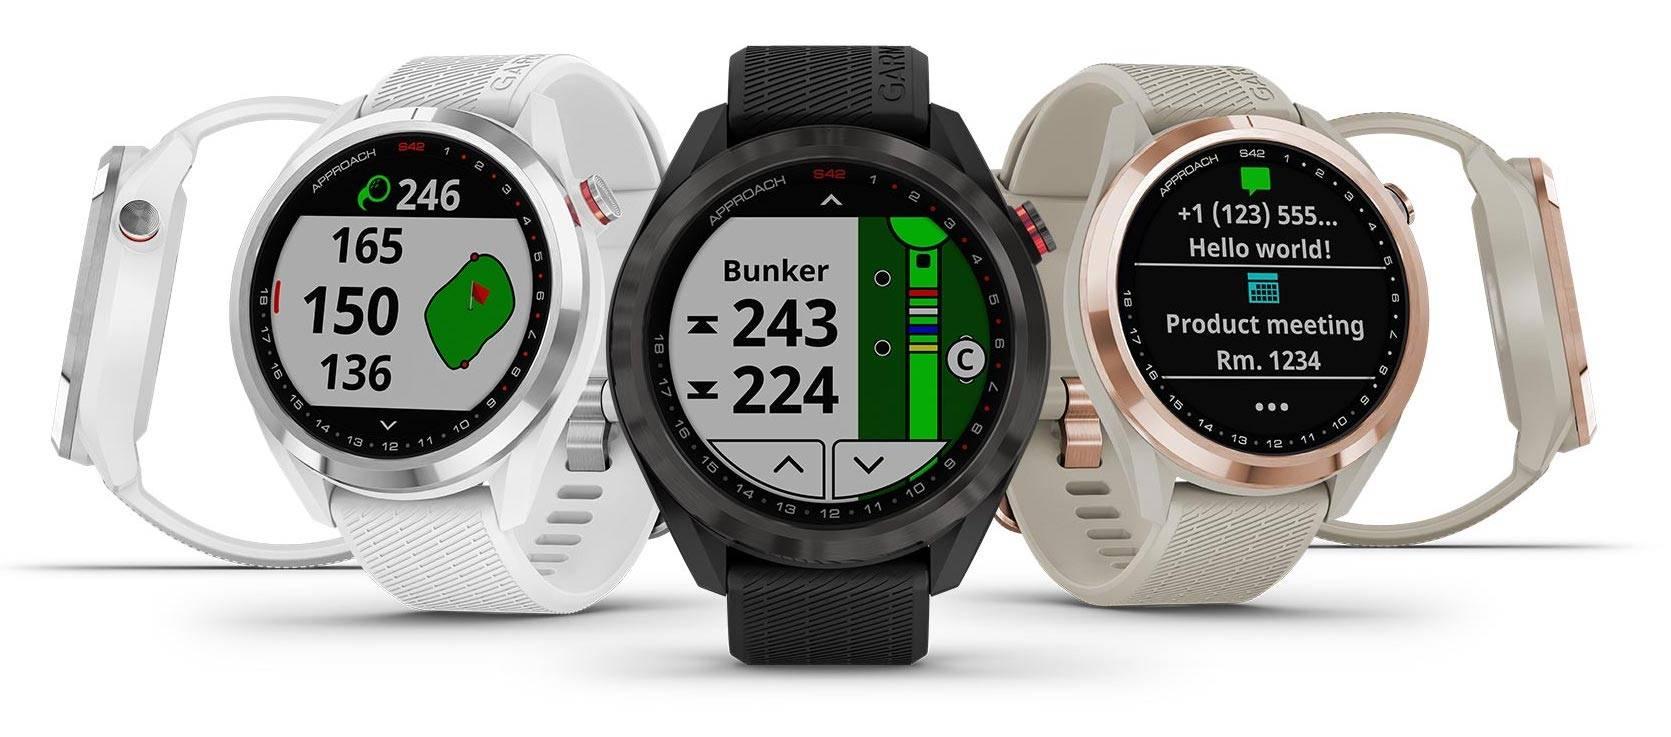 The Garmin Approach S12, S42, S62 golf GPS watches